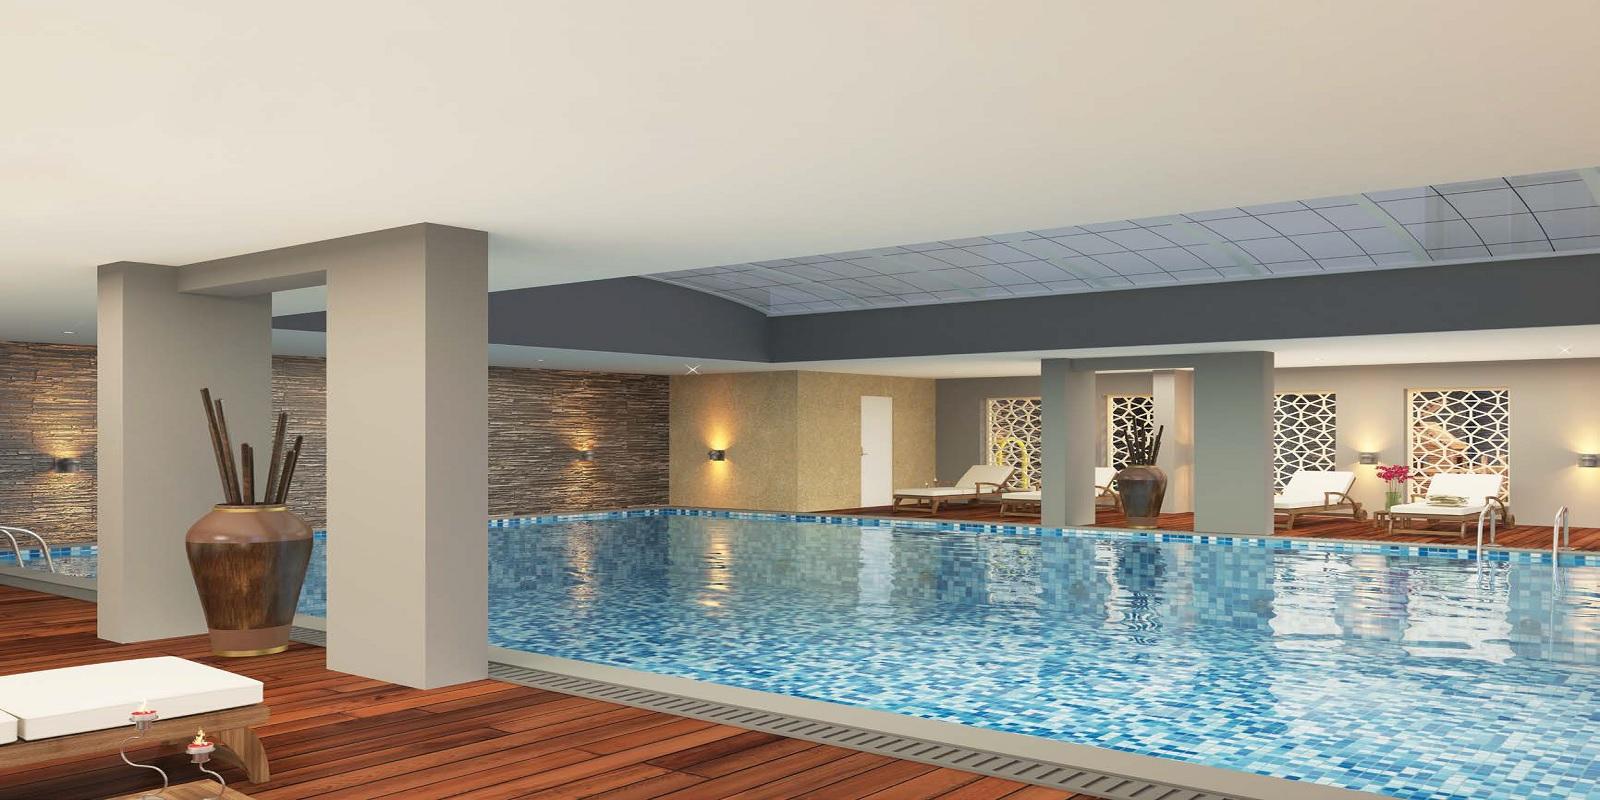 f5 mount unique project amenities features1